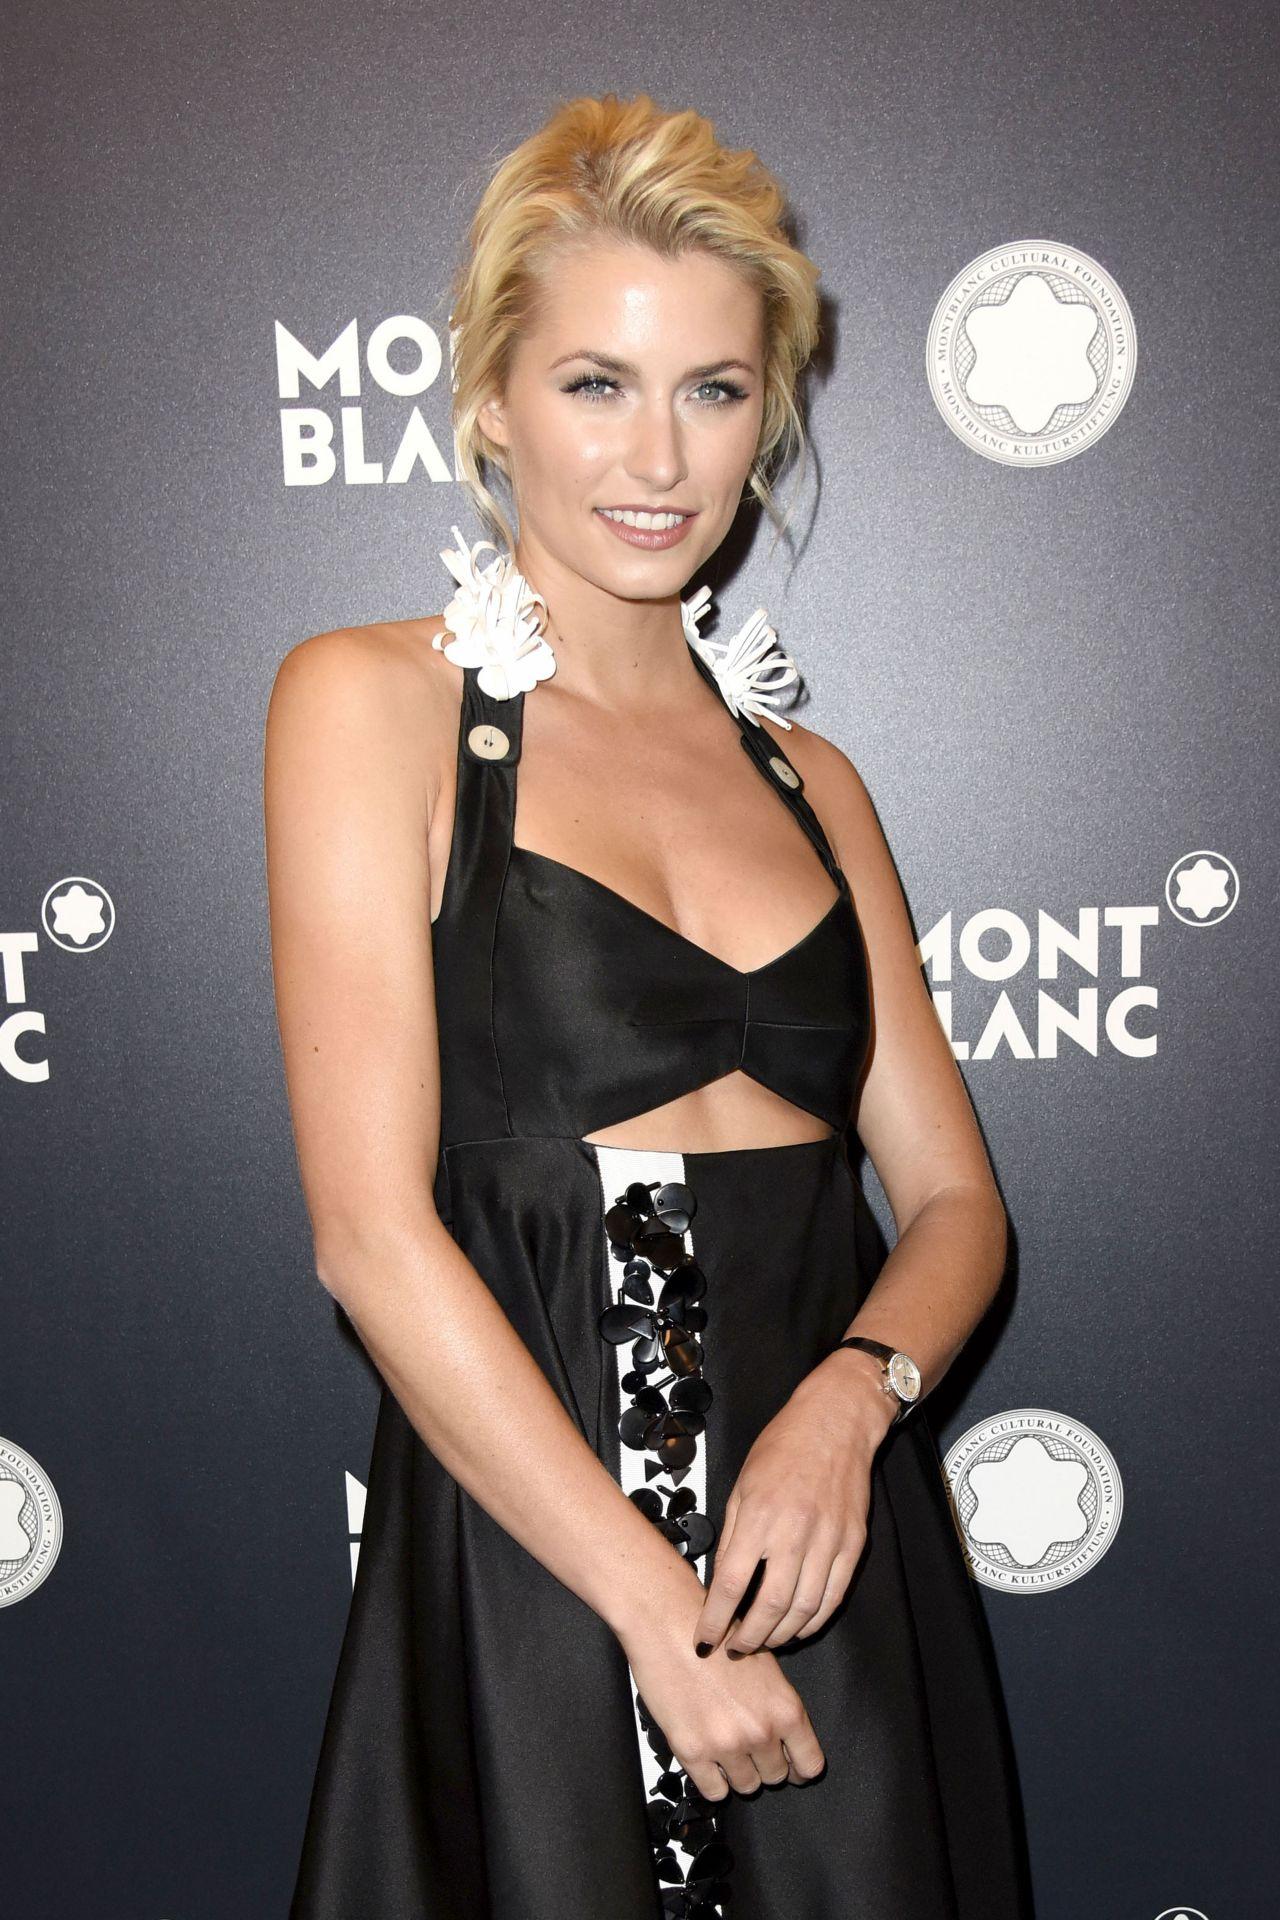 Lena gercke montblanc de la culture arts patronage award in berlin 06 13 2017 for Celebrity watches female 2017